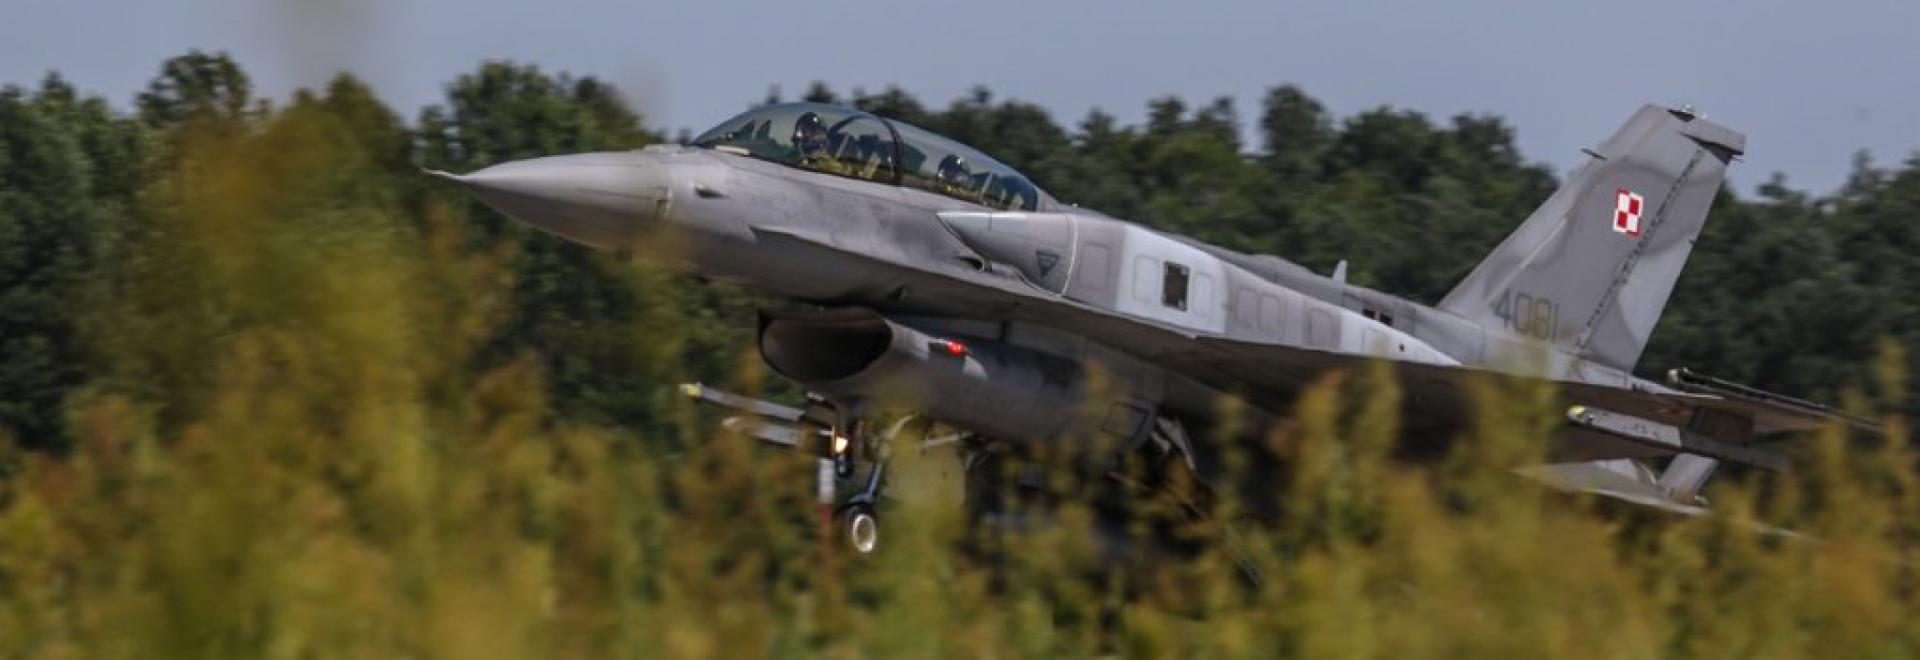 Samolot wojskowy - element slidera